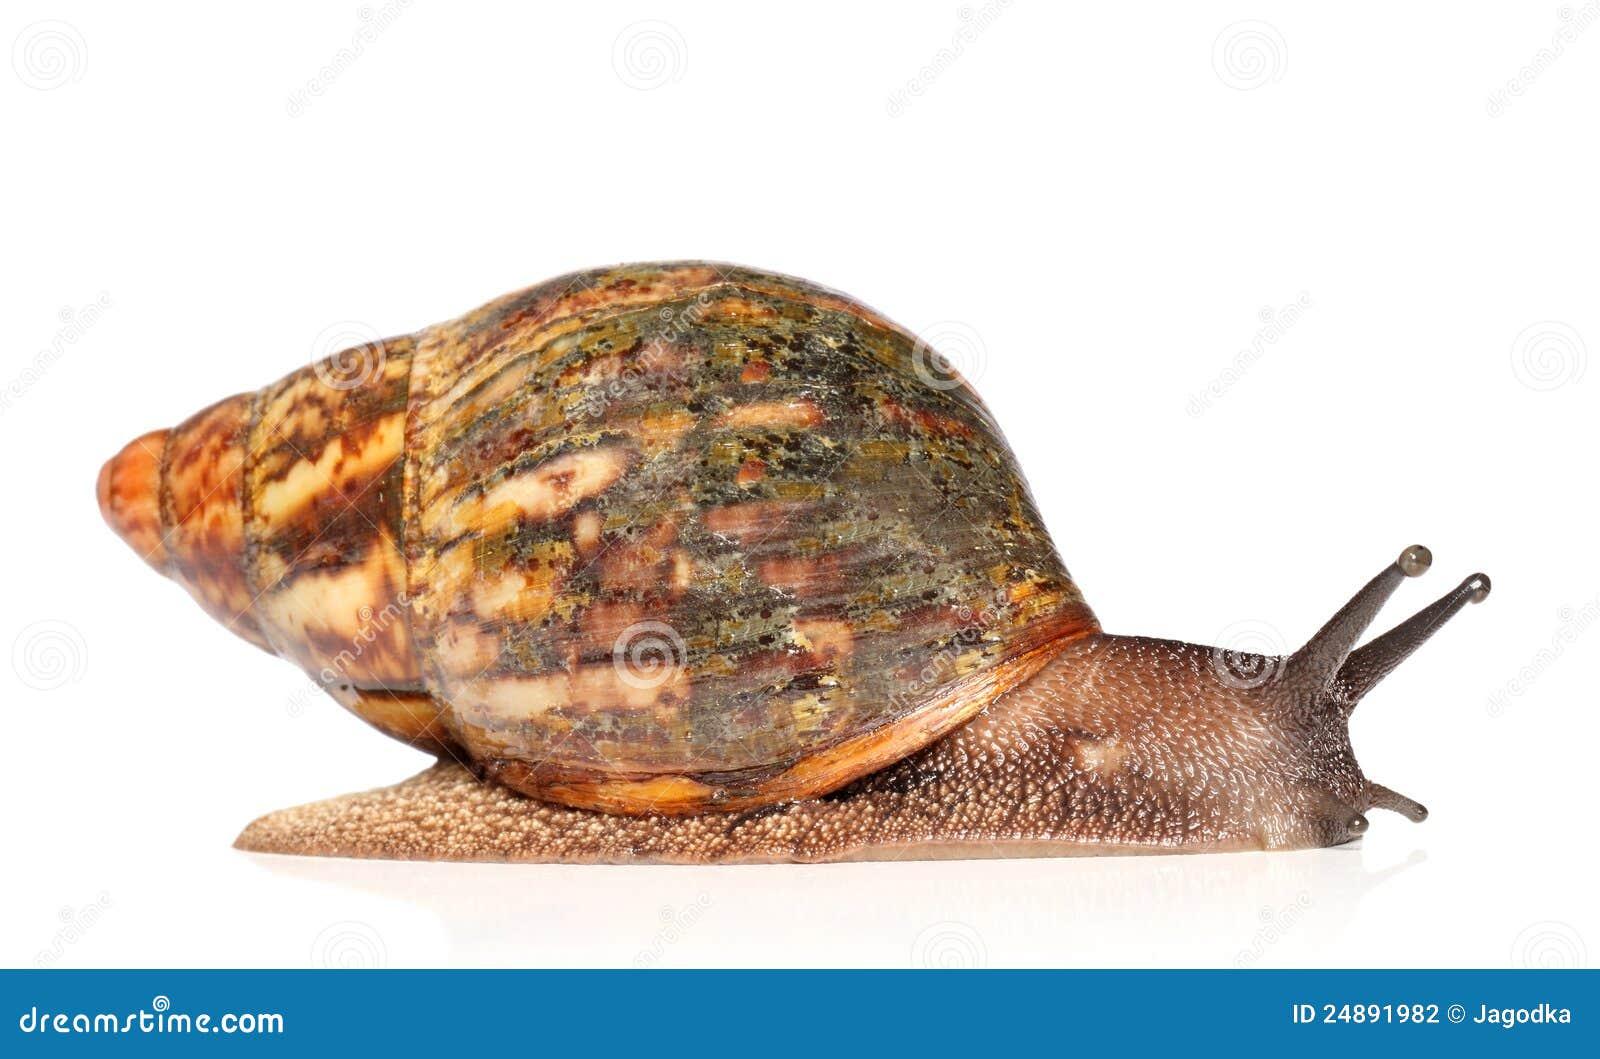 Giant Lumaca Africana Achatina Strisciando Archivio Fotografico - Immagine 24891982-7675